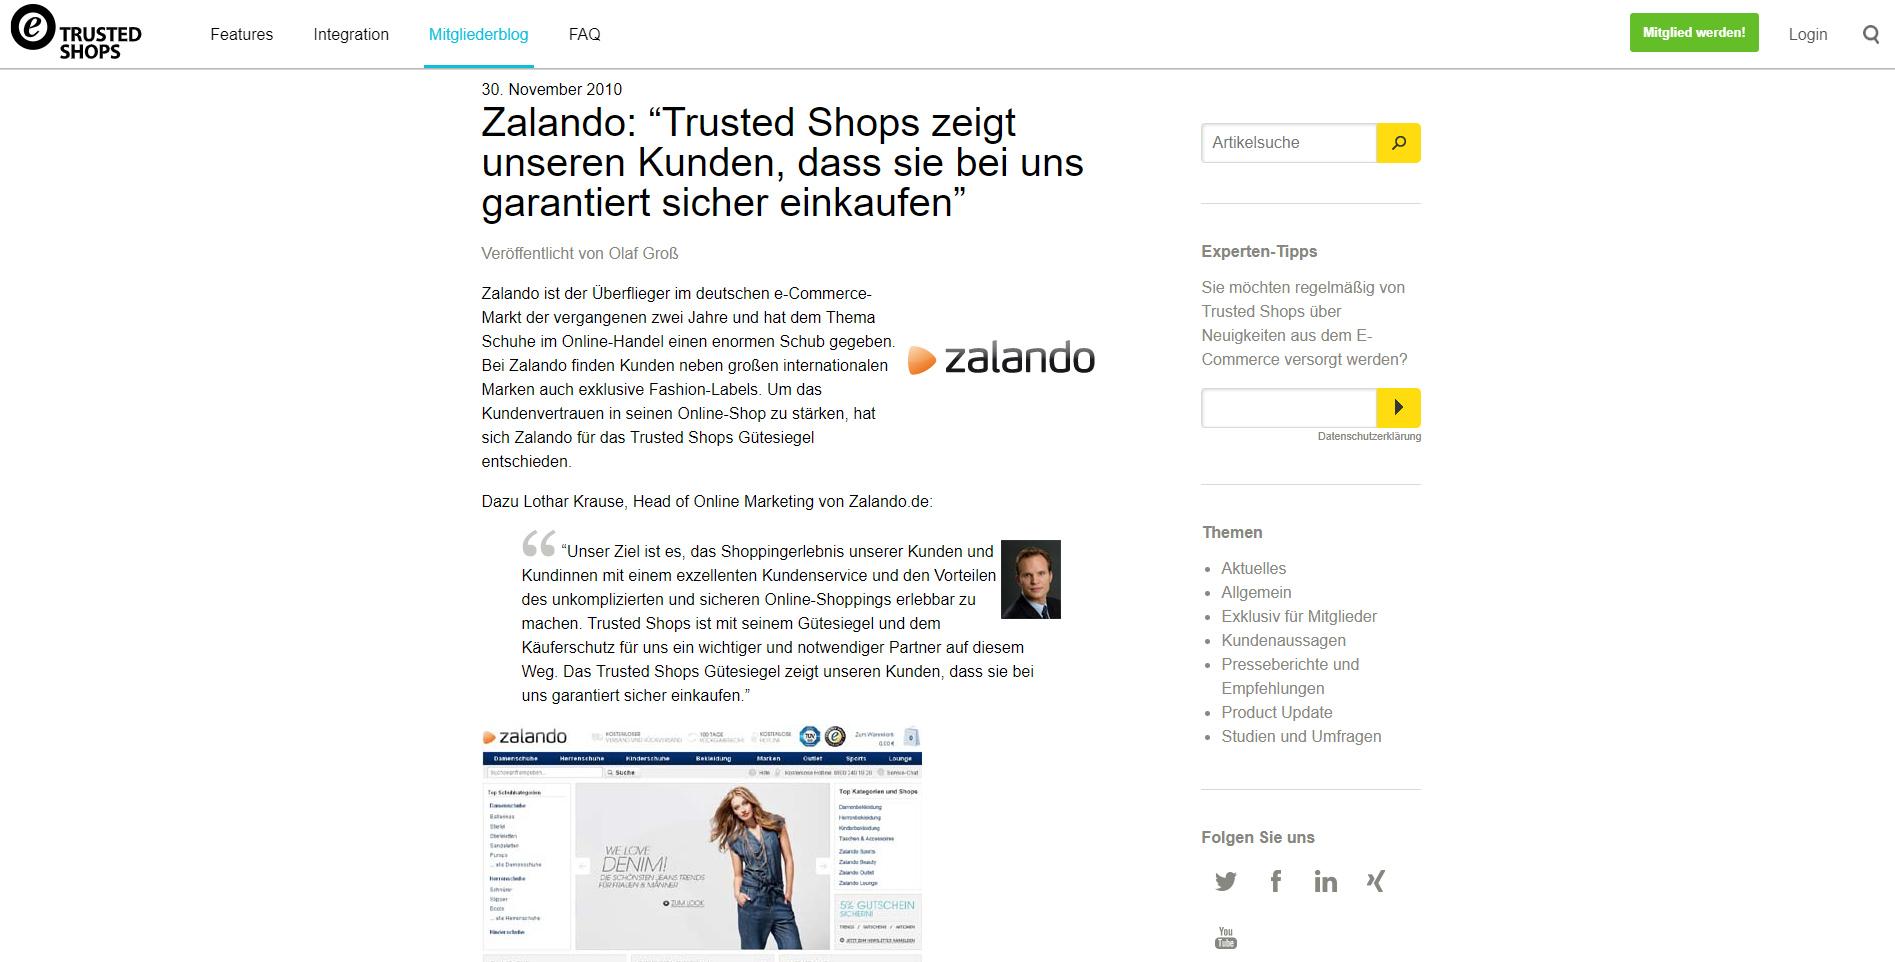 Zalando Trusted Shops